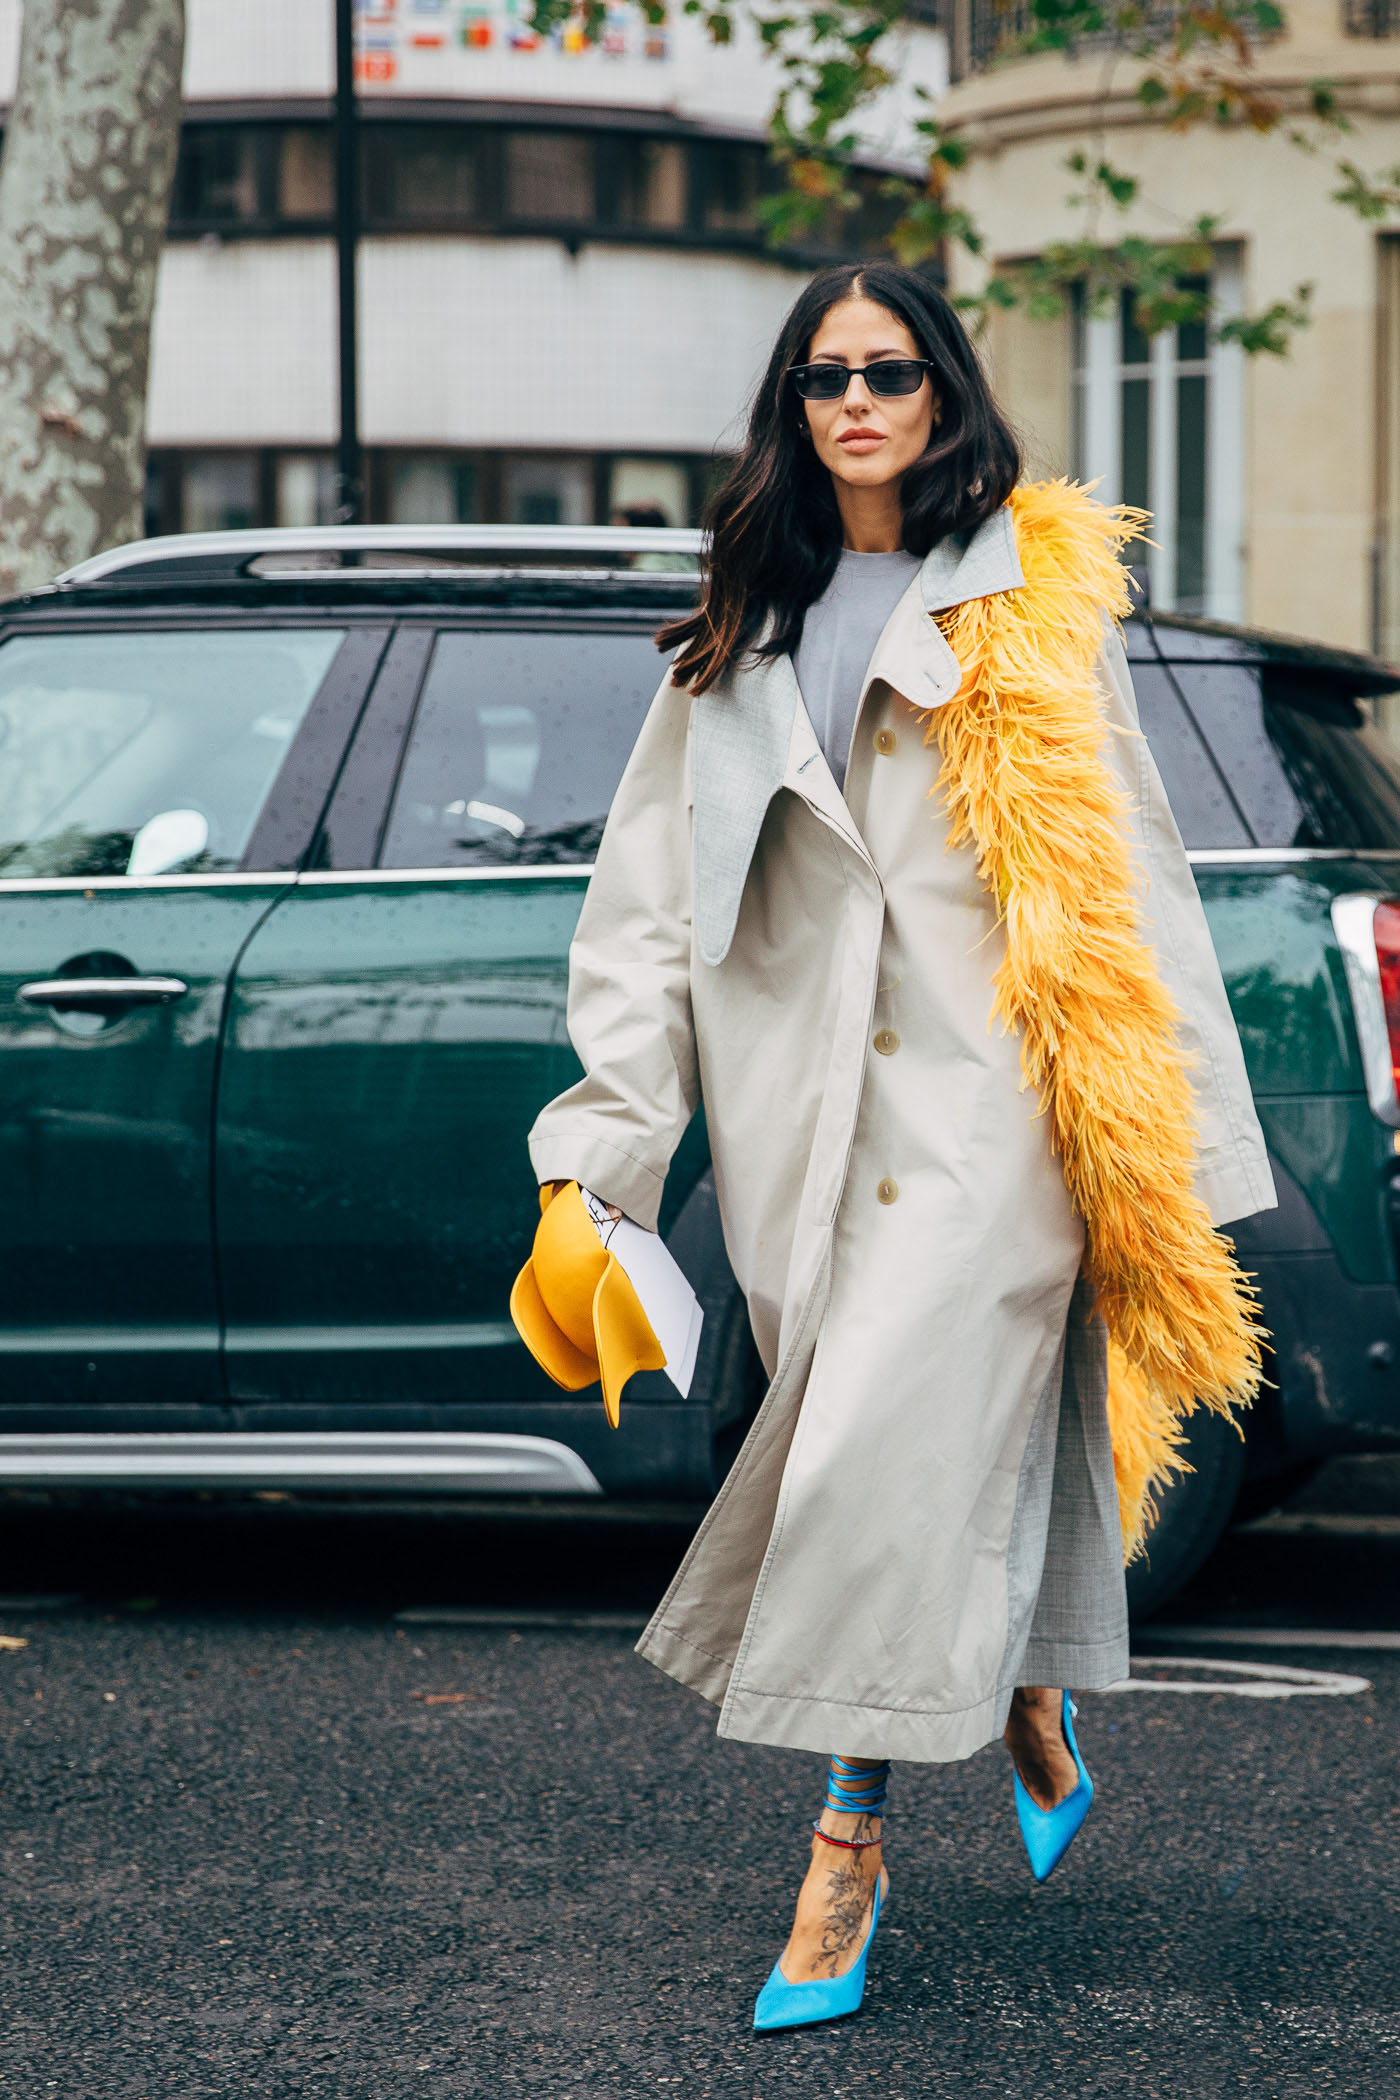 Gilda-Ambrosio-by-STYLEDUMONDE-Street-Style-Fashion-Photography20190927_48A1683